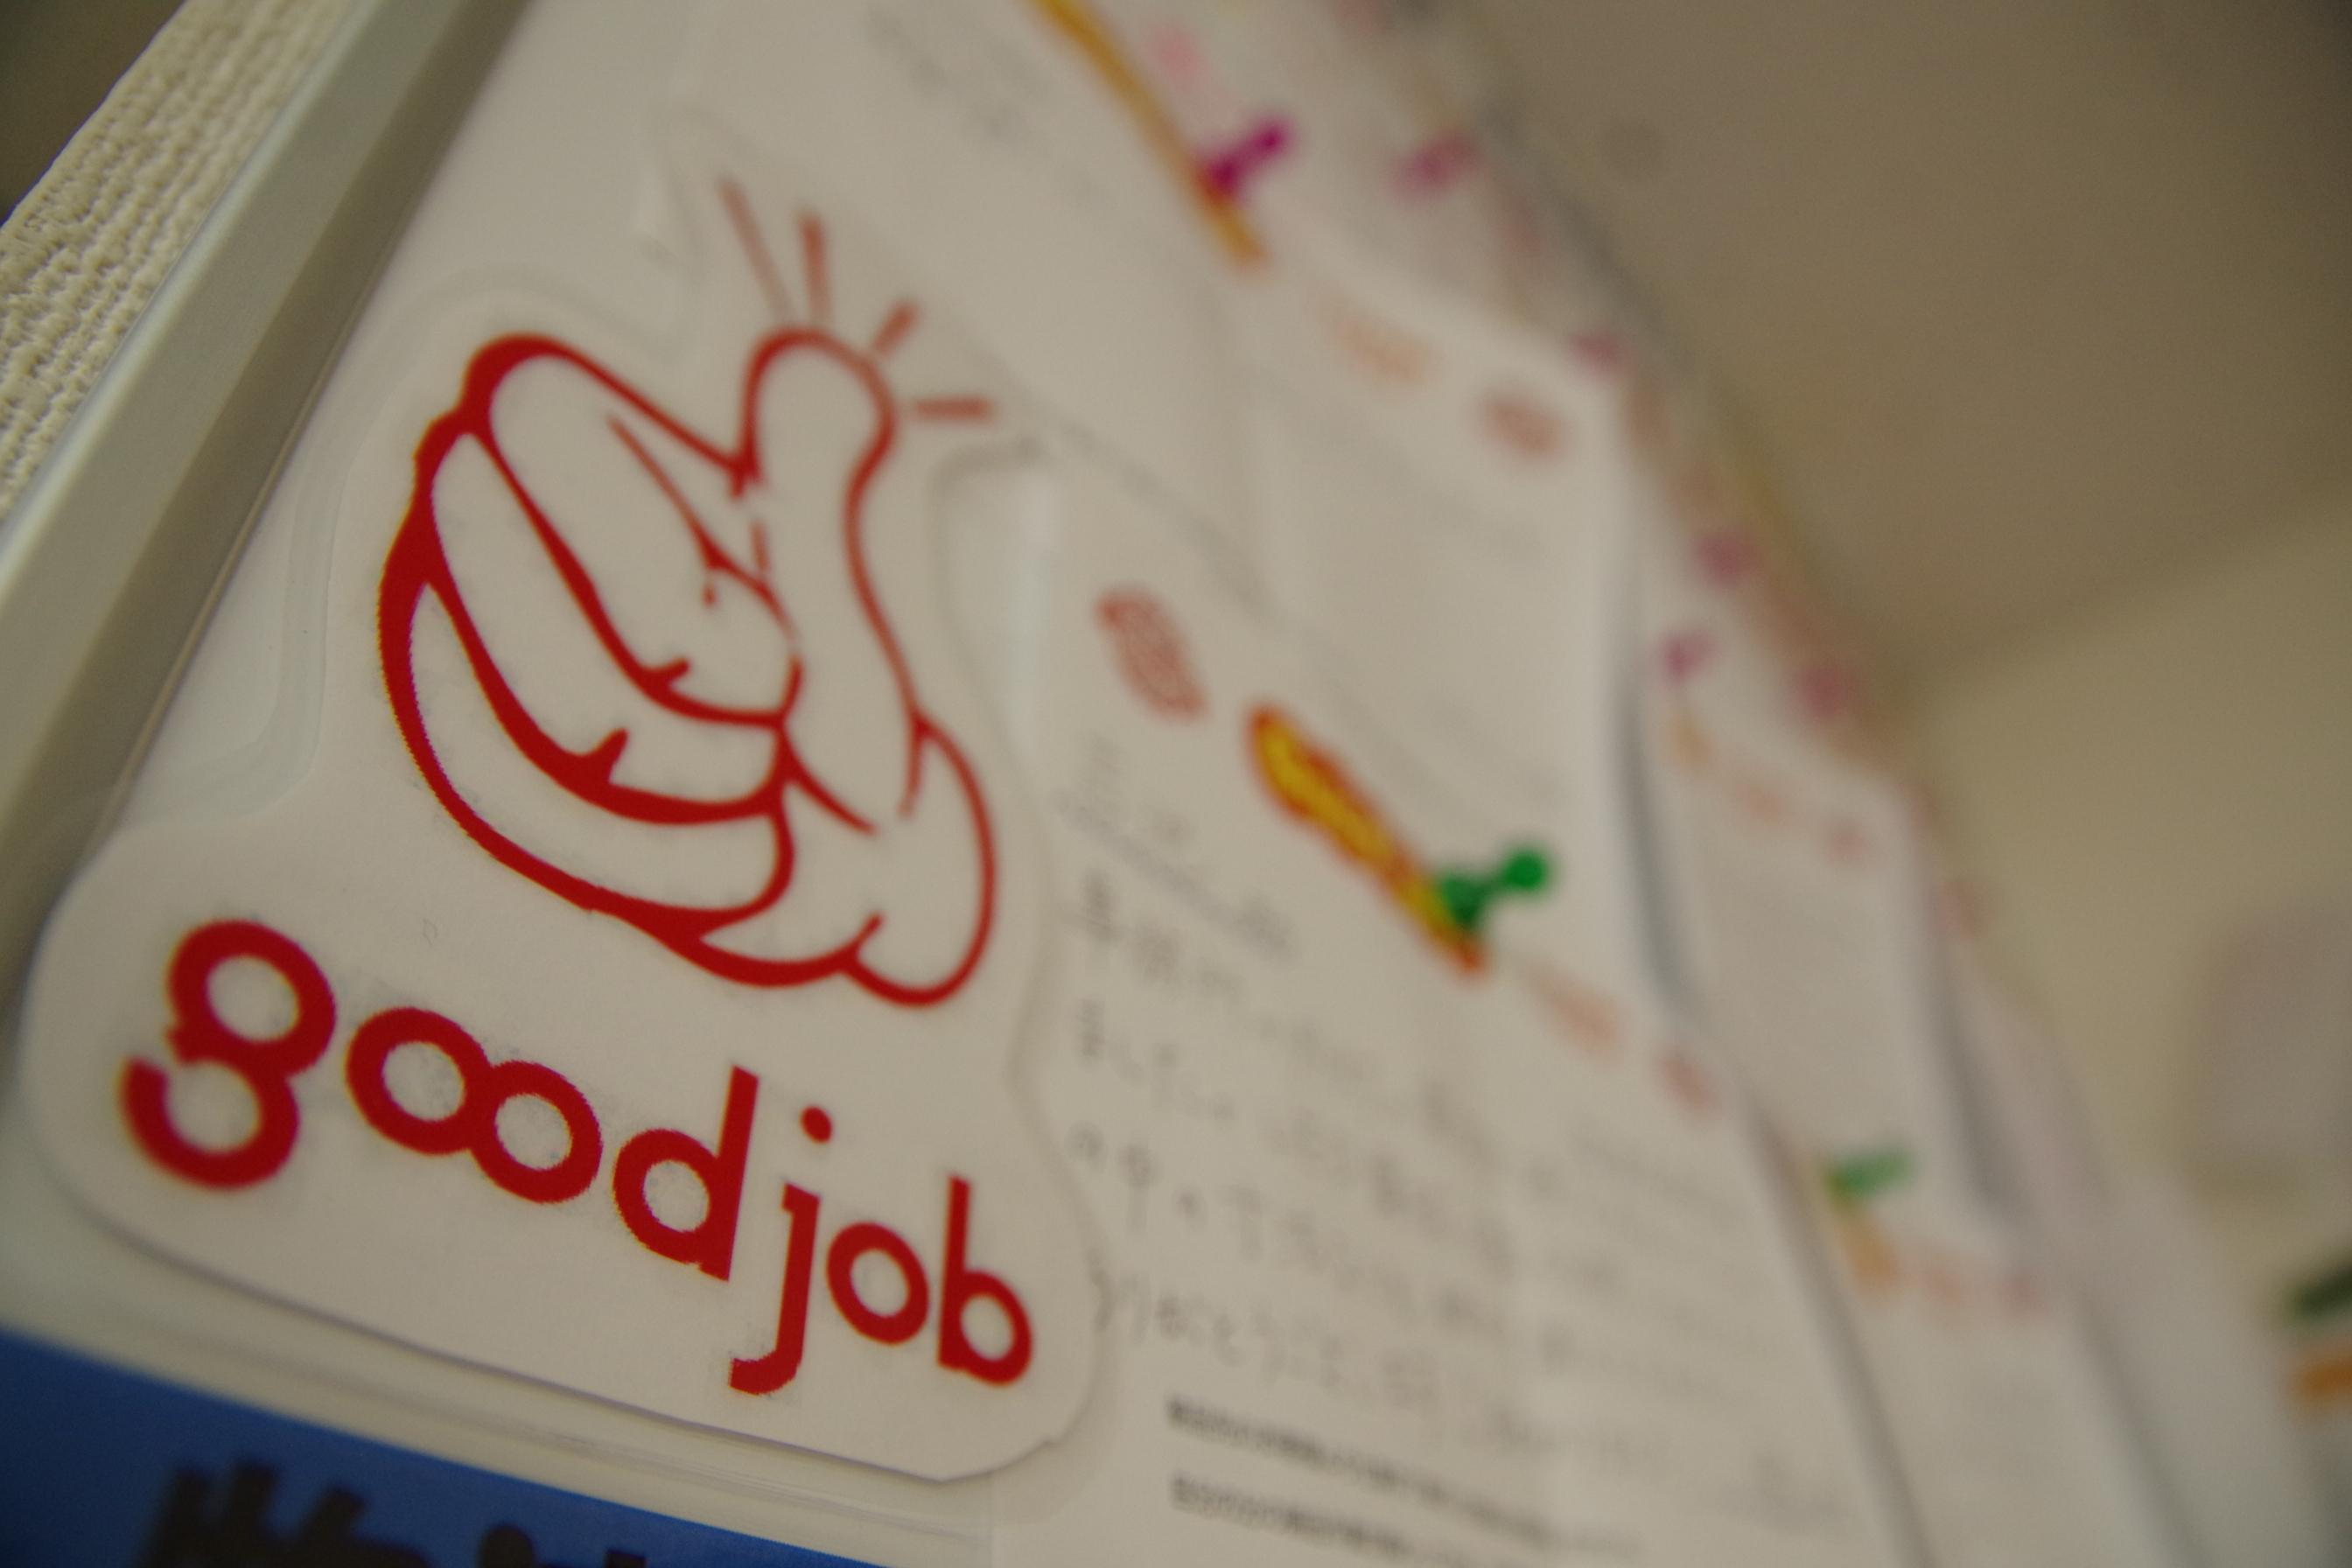 Good Job カード